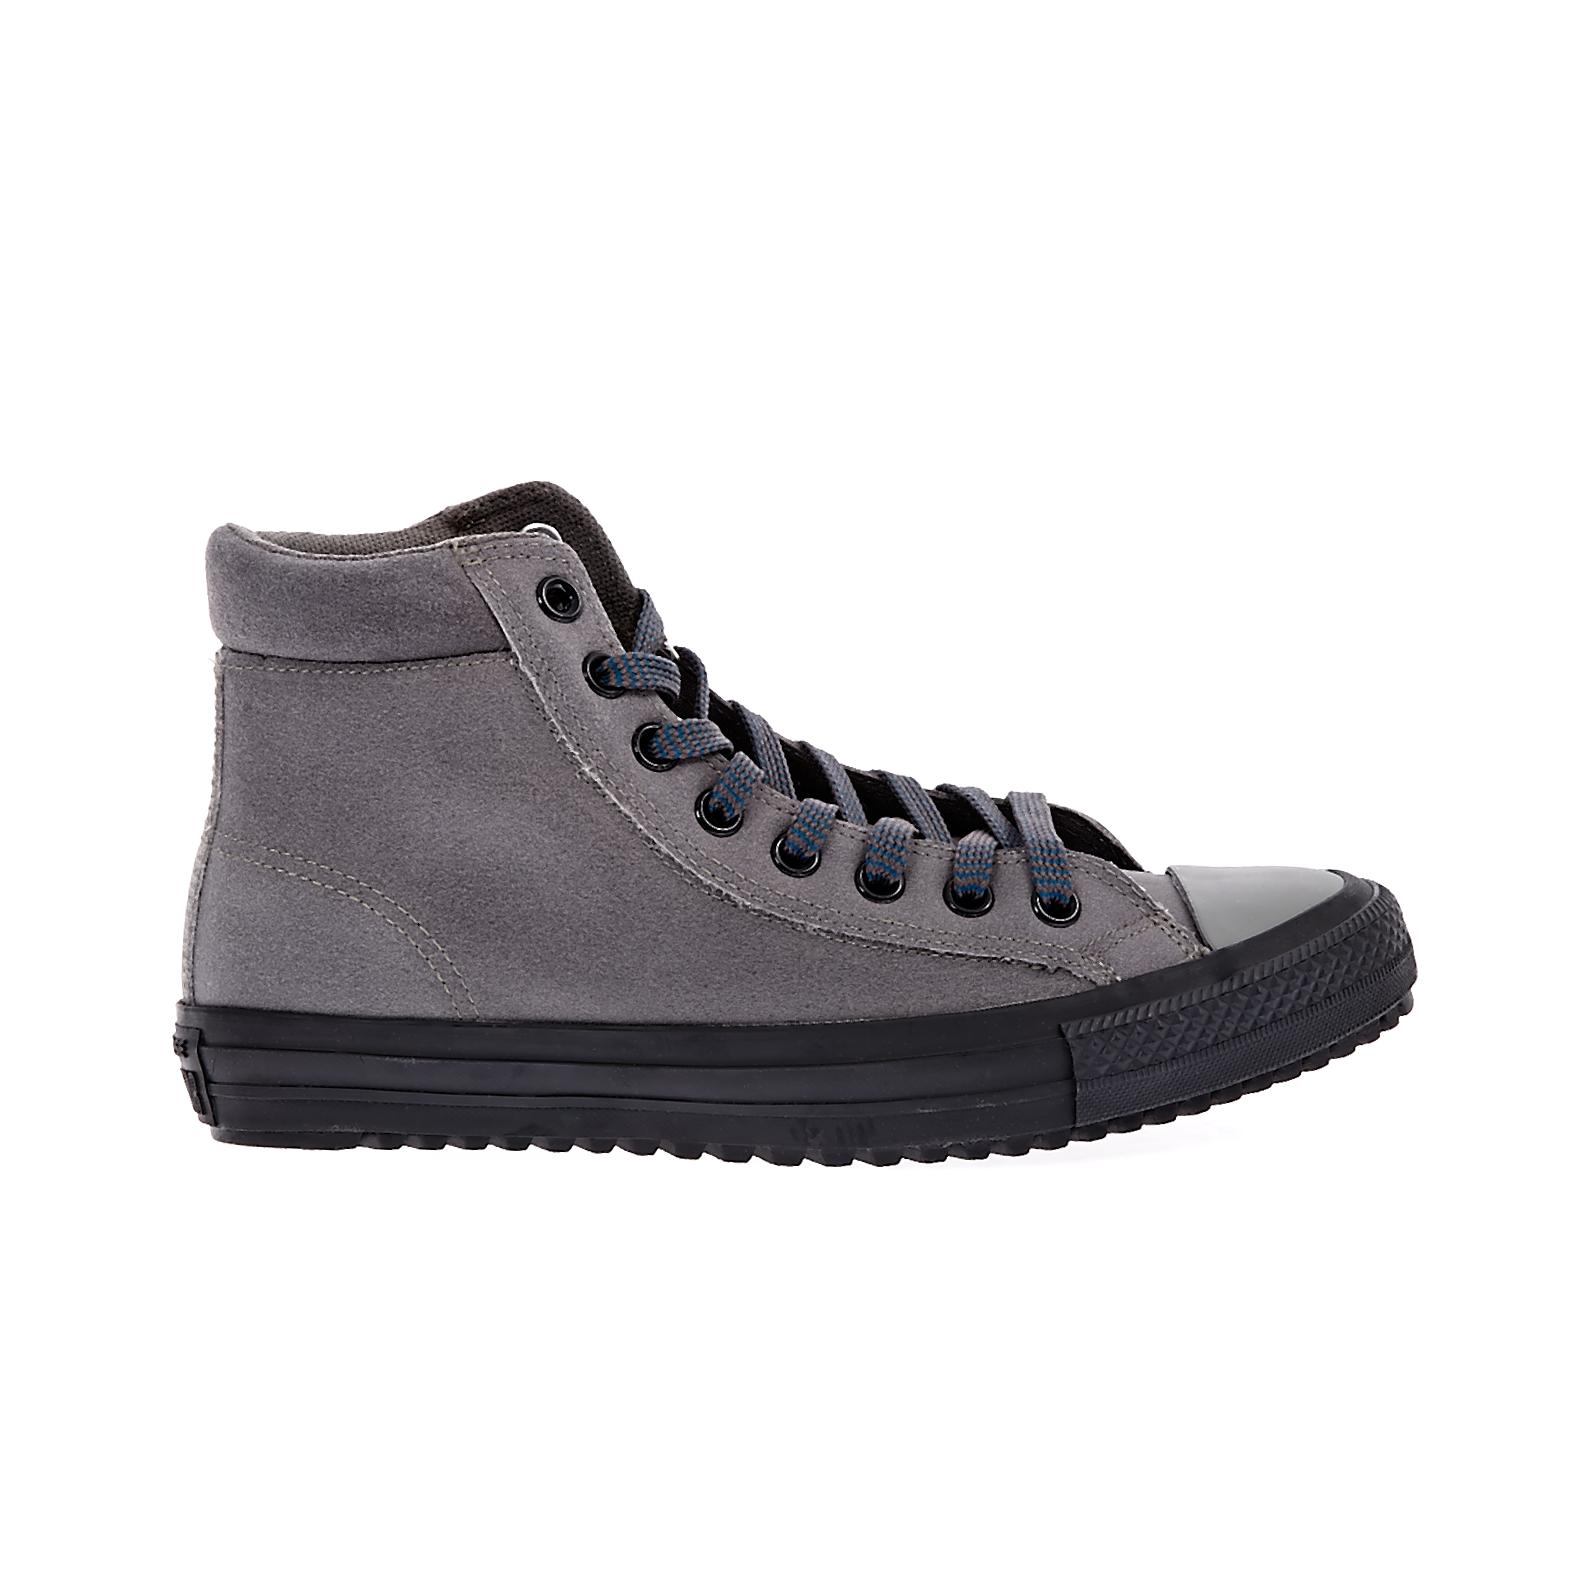 CONVERSE - Unisex παπούτσια Chuck Taylor All Star Converse γκρι ανδρικά παπούτσια sneakers